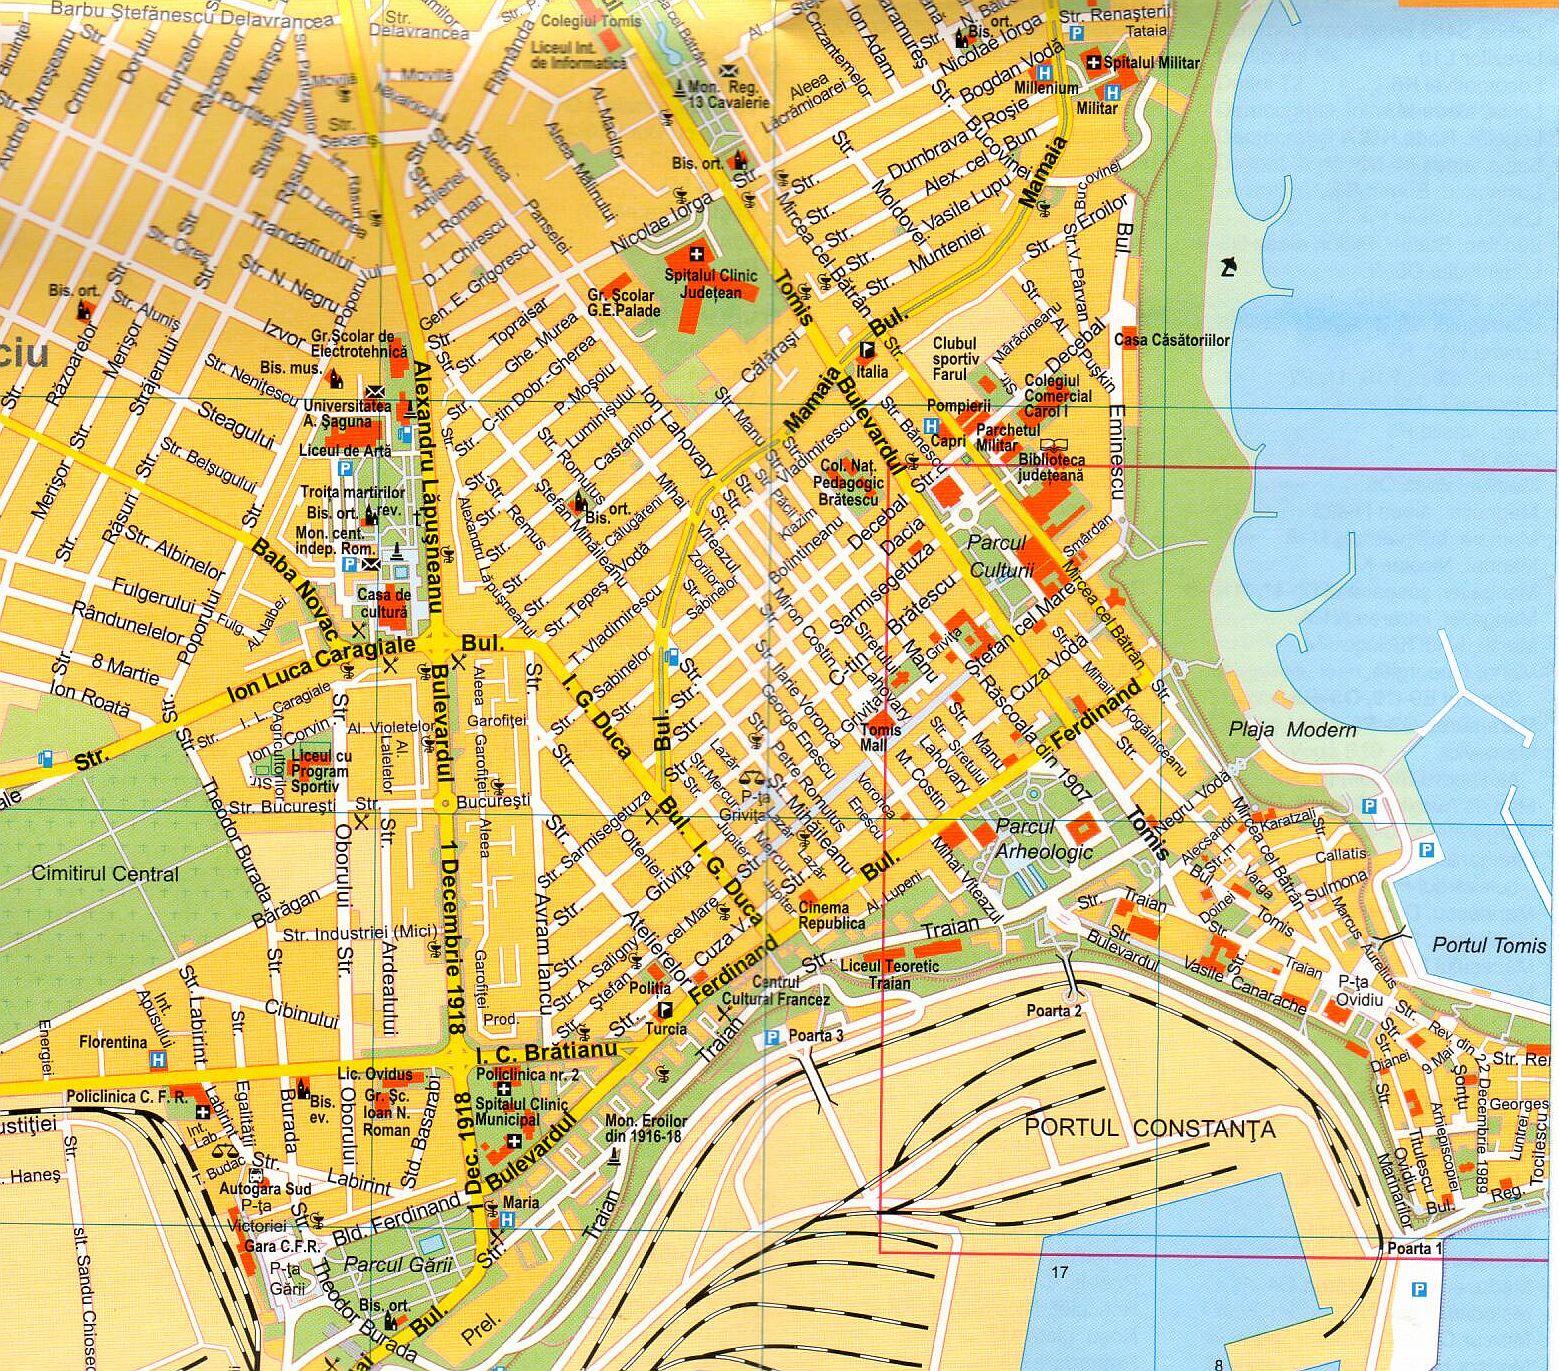 Constanta sample map 1:15.000